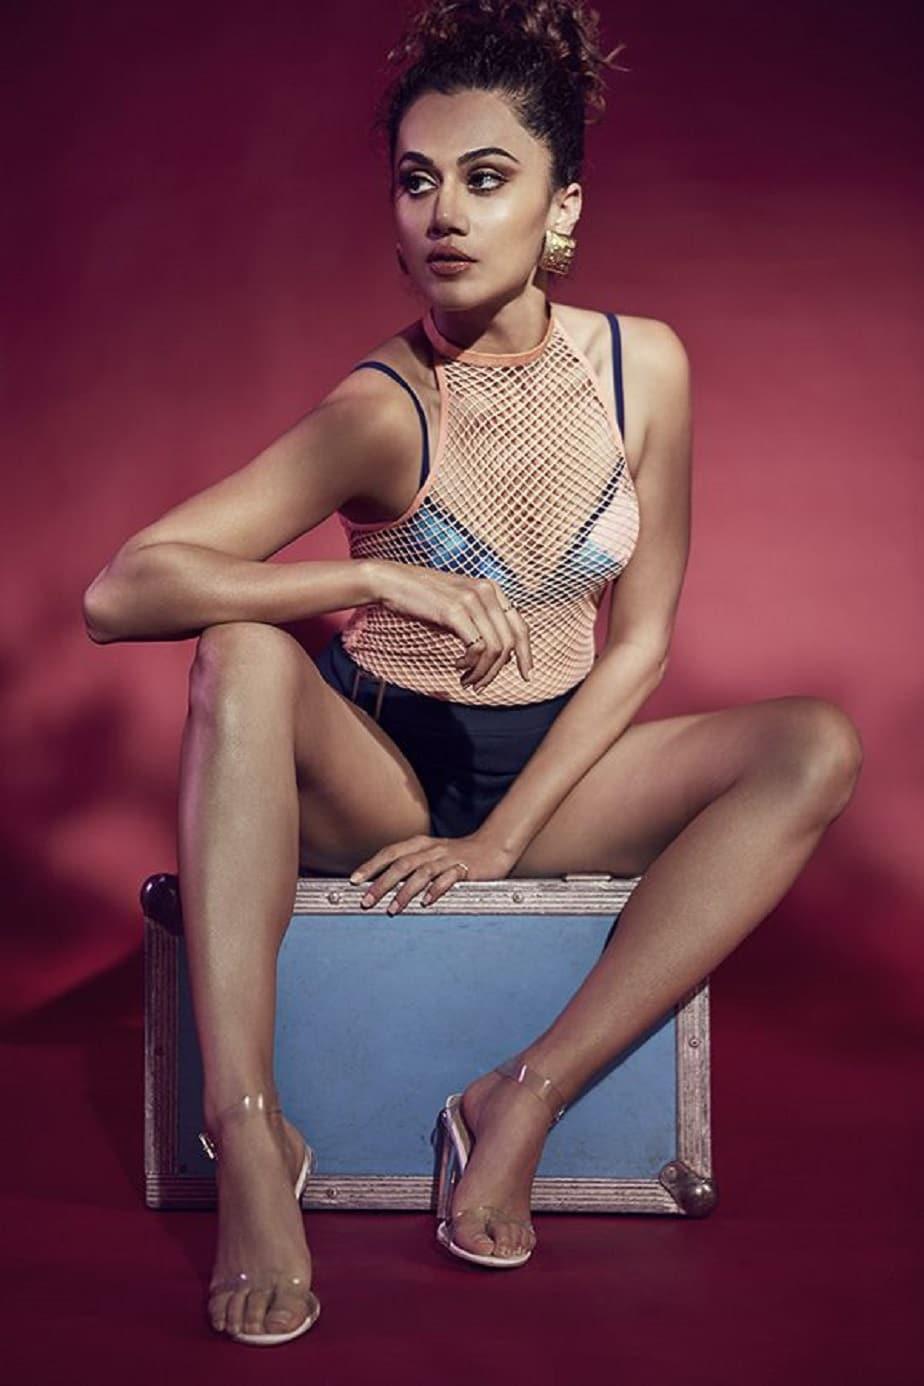 bollywood-actress-taapsee-pannu-bikini-photoshoot-showing-deep-cleavage